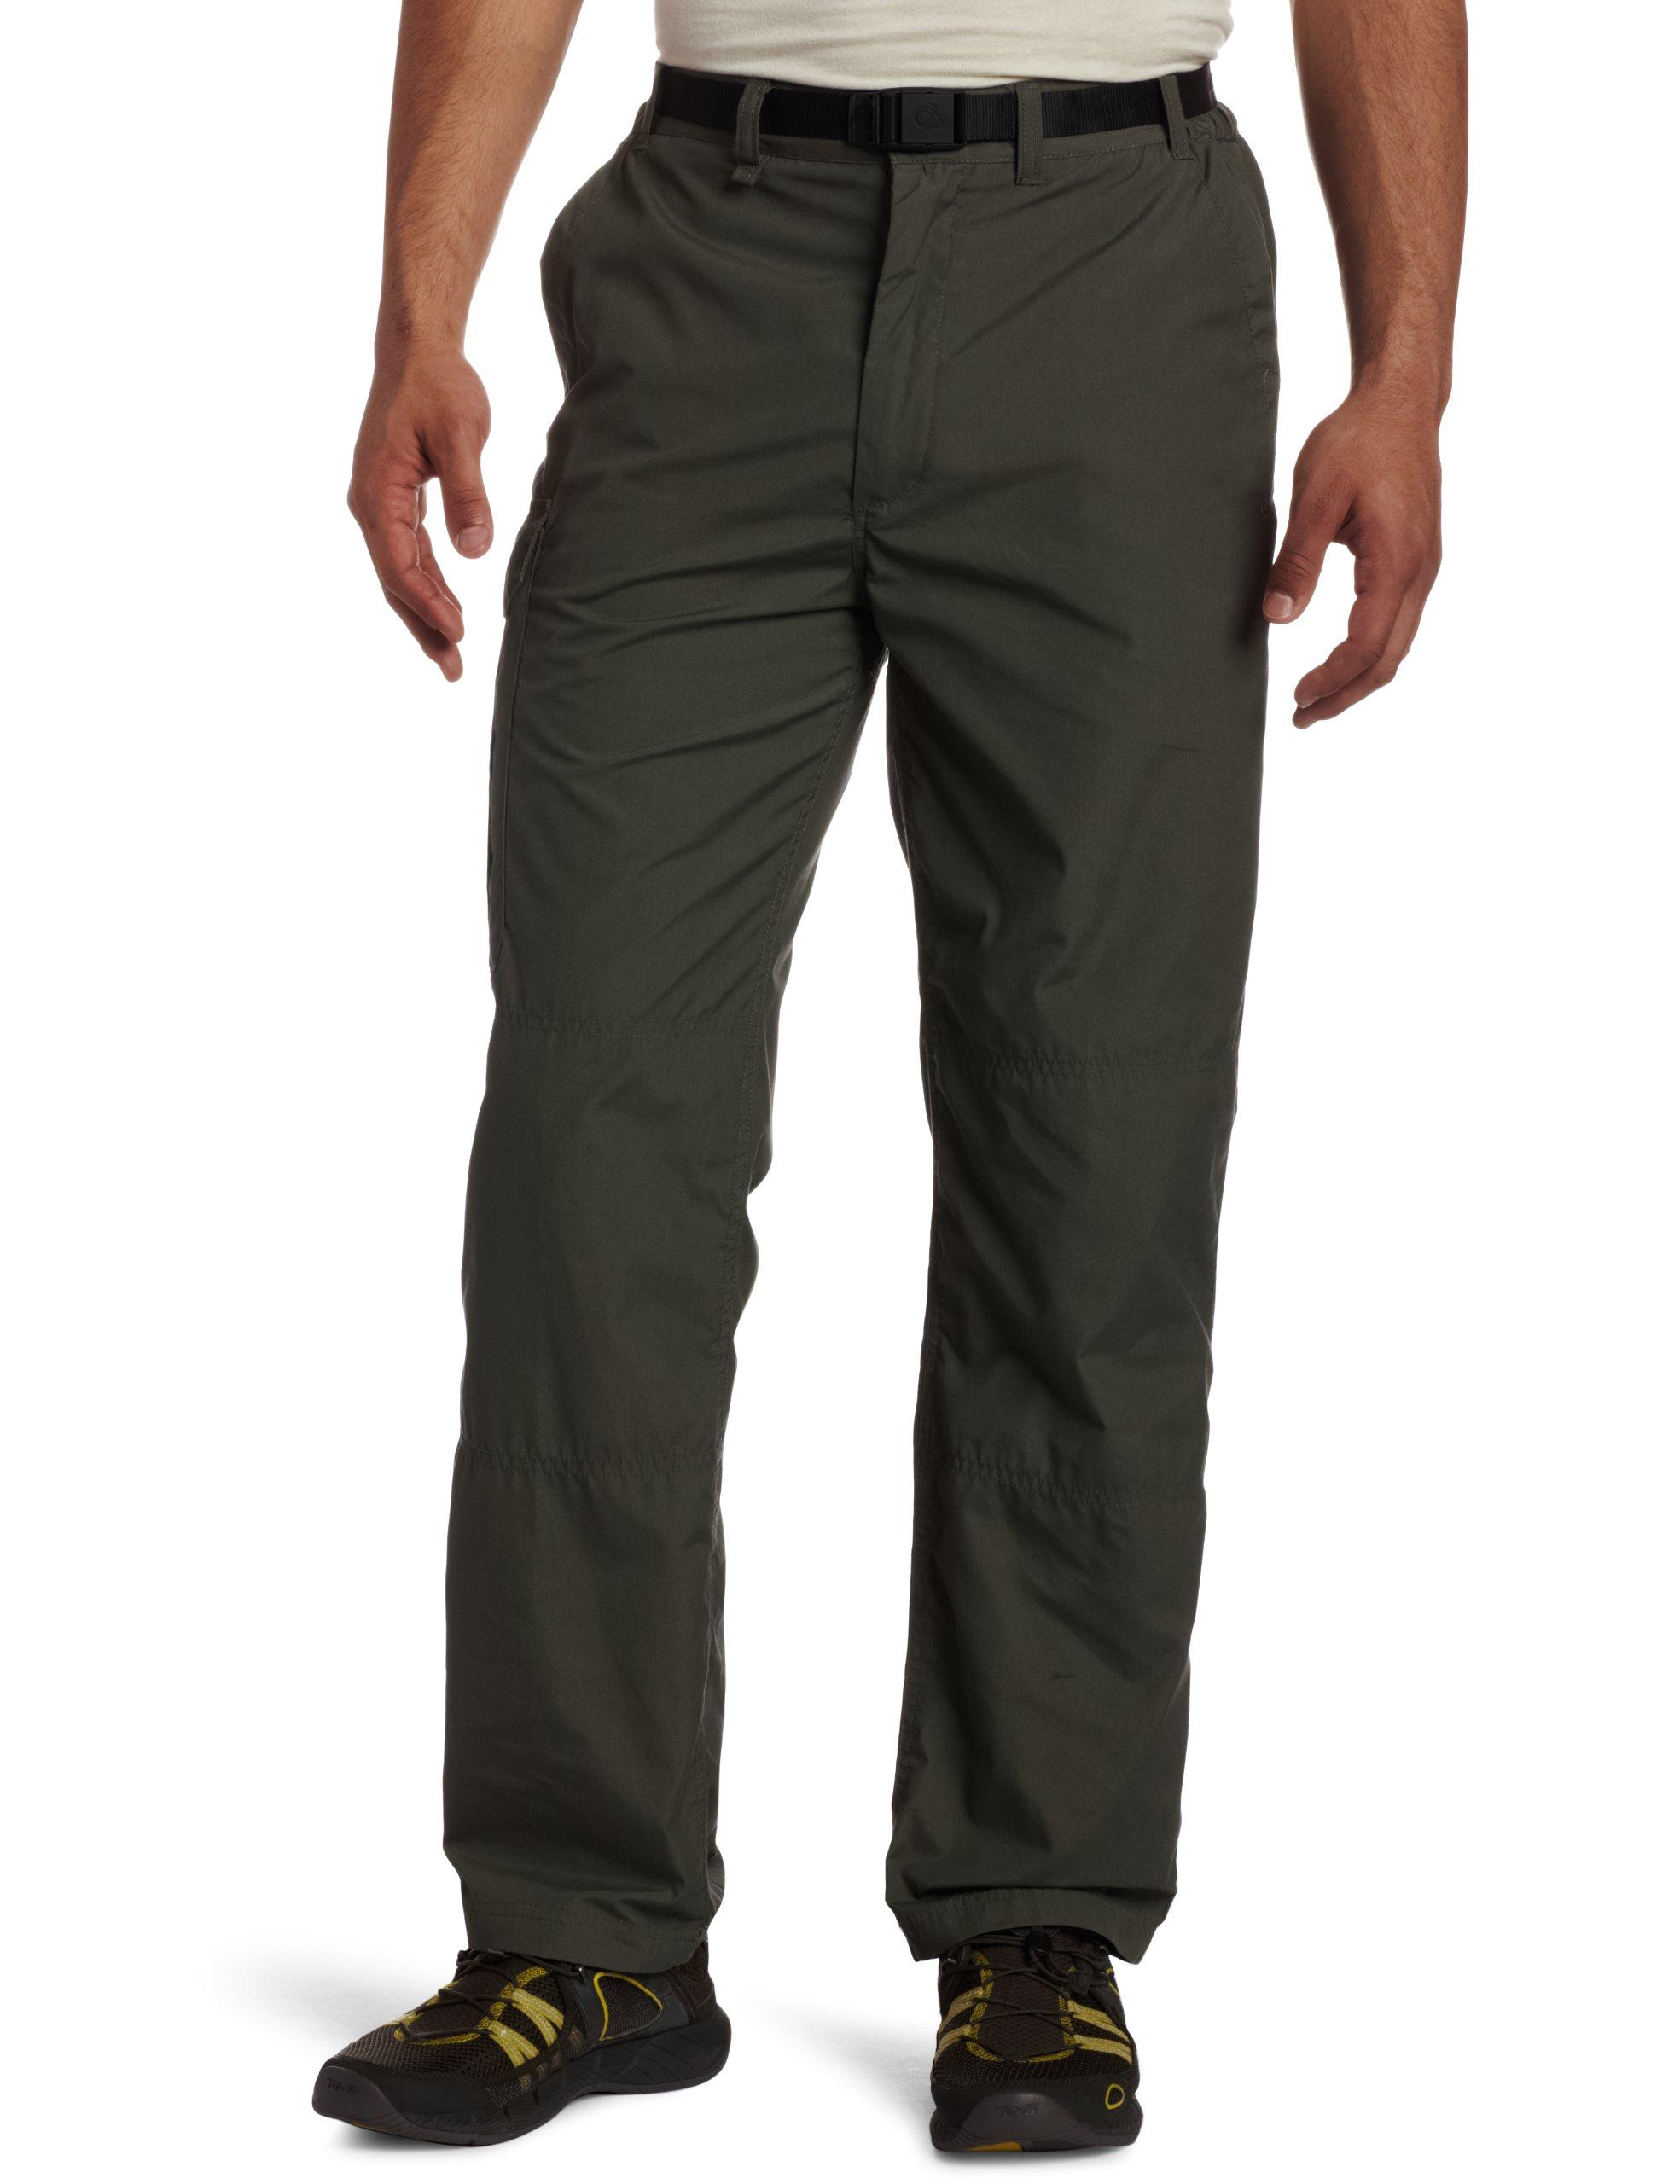 Craghoppers Men's Classic Kiwi Trousers (Regular), 32-Inch, Cedar by Craghoppers